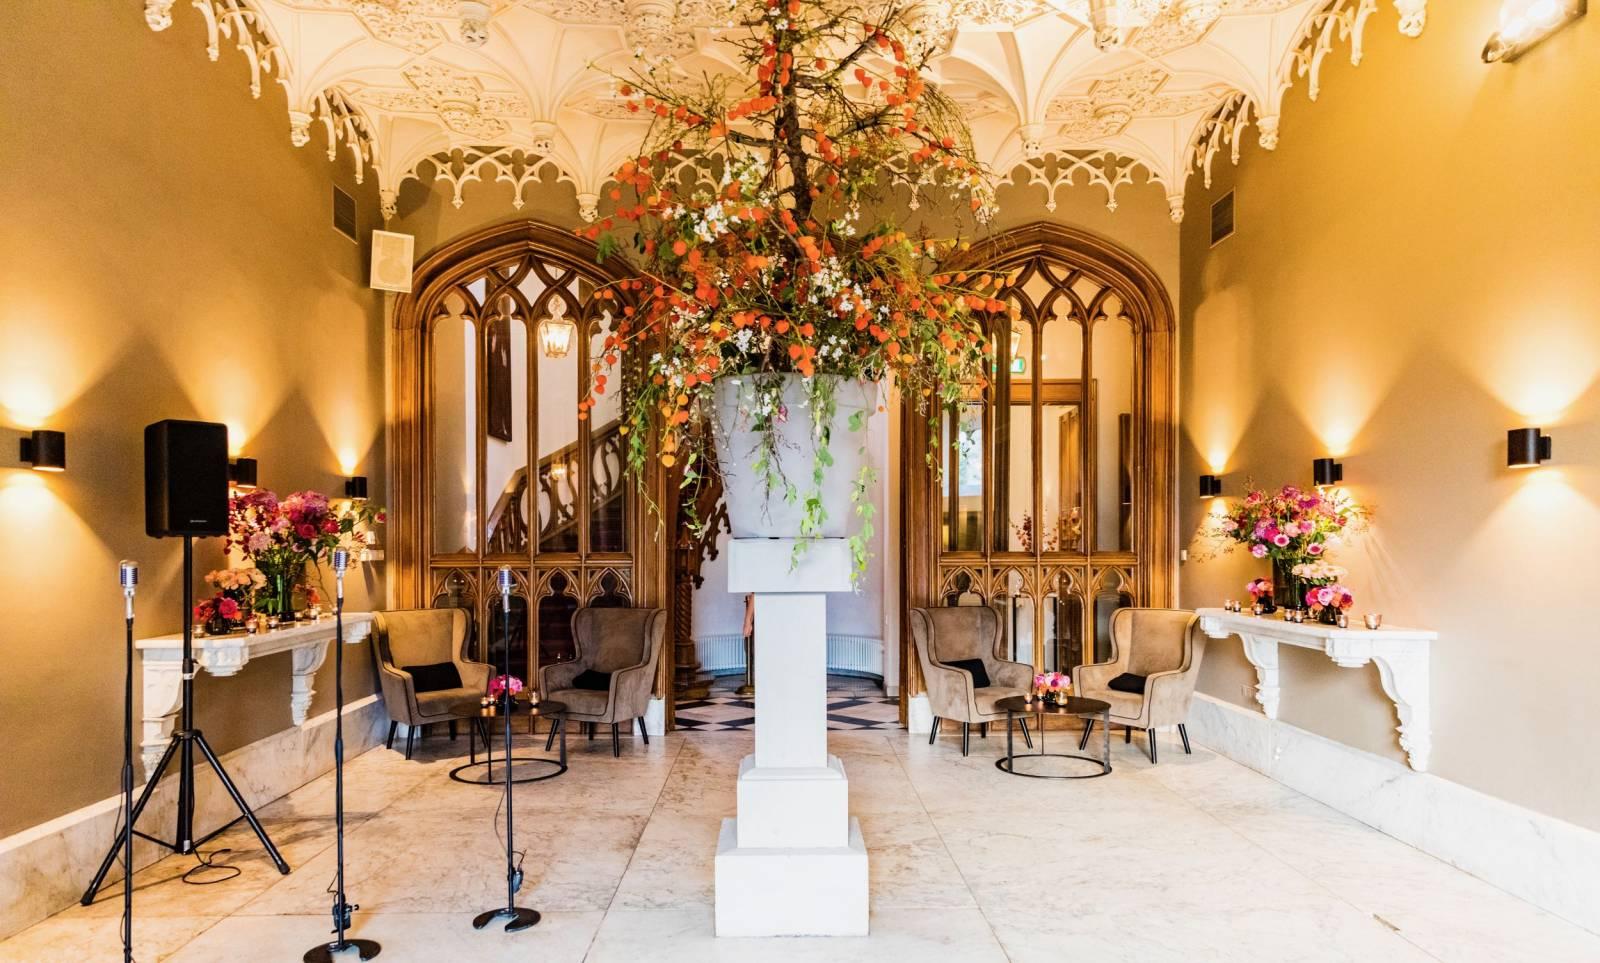 Wolterinck Event Decoration - Verhuur & Decoratie - House of Events - 27